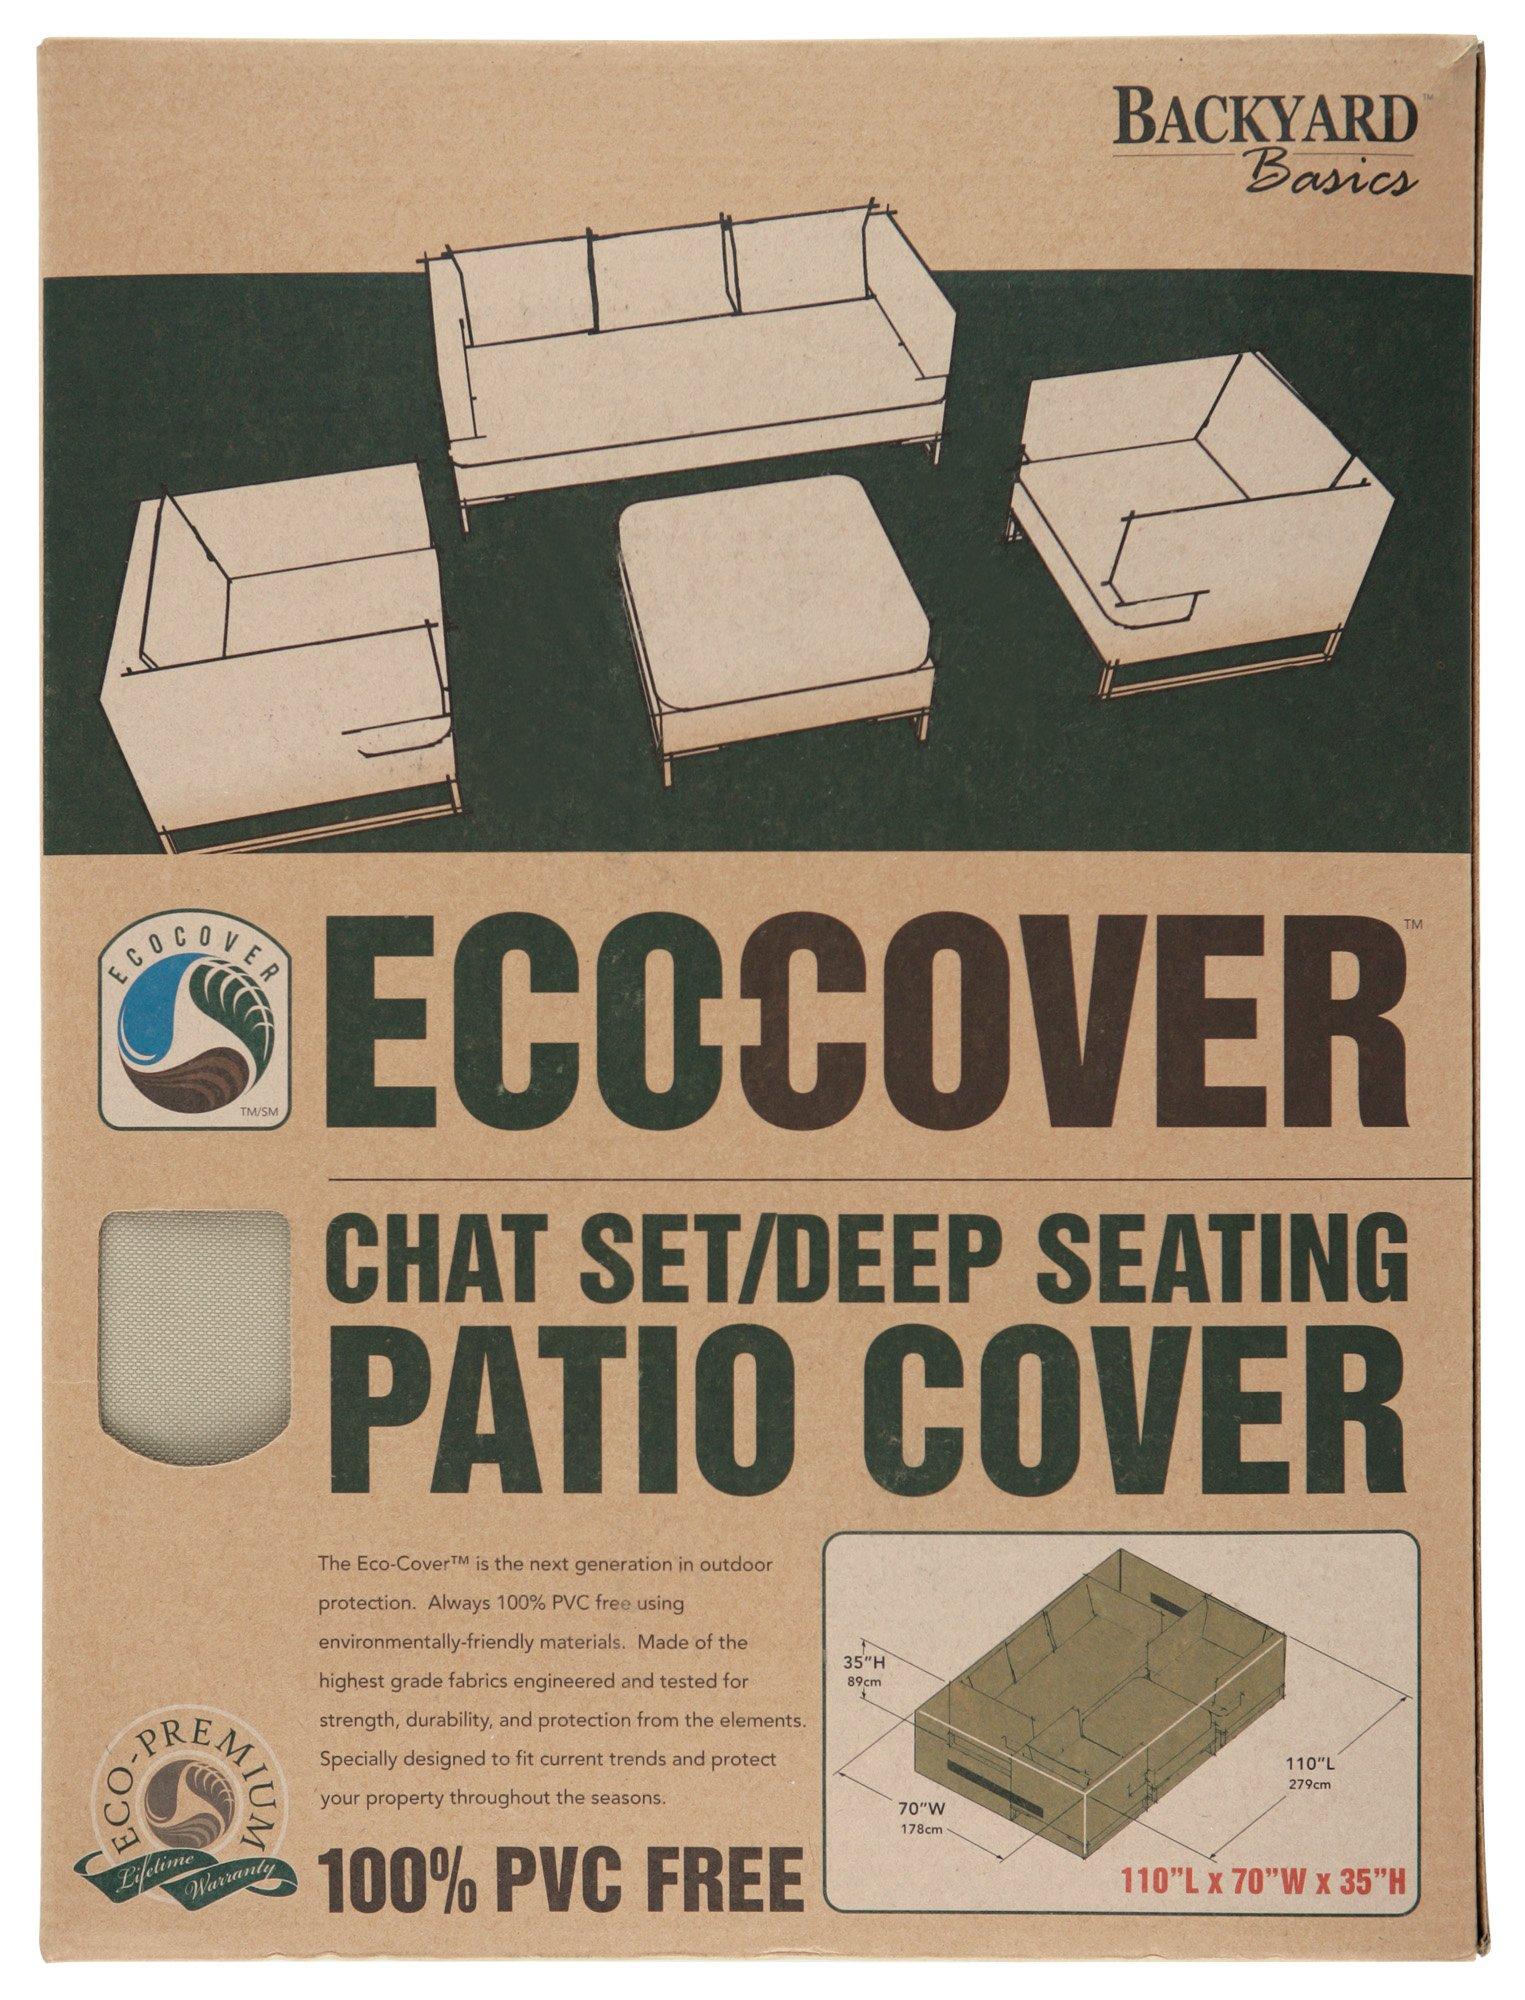 Mr. Bar-B-Q Backyard Basics Eco-Cover PVC Free Chat Set/Deep Seating Cover